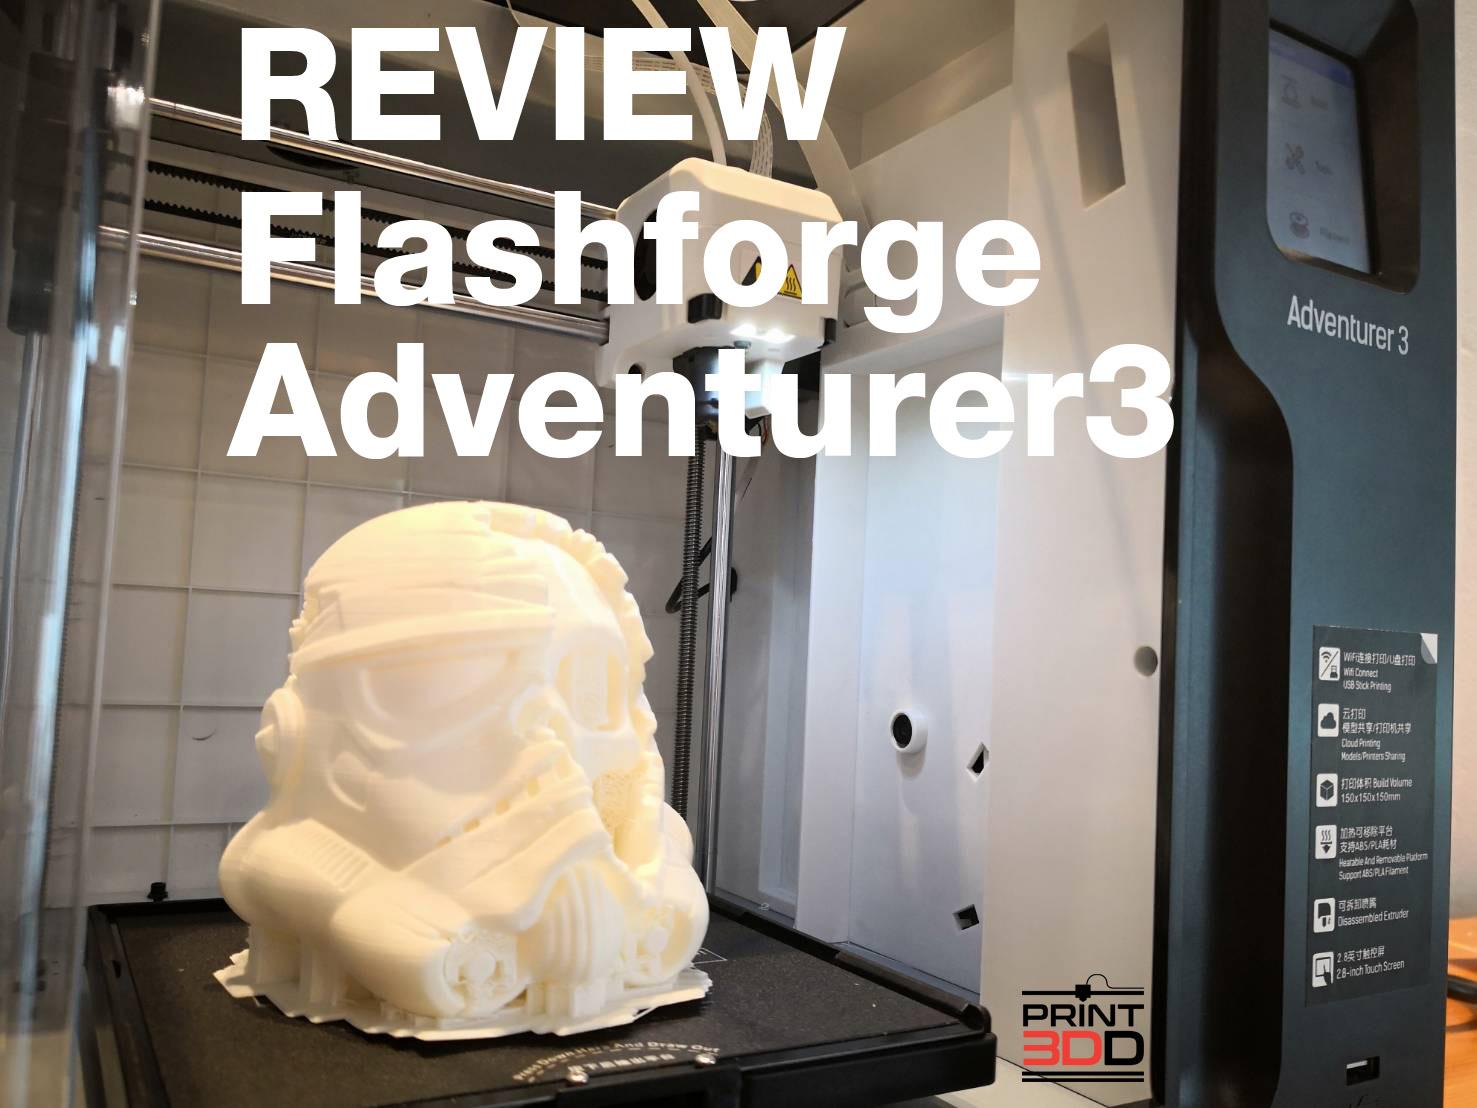 Review Flashforge Adventurer3 รุ่นเล็ก แต่จัดเต็ม